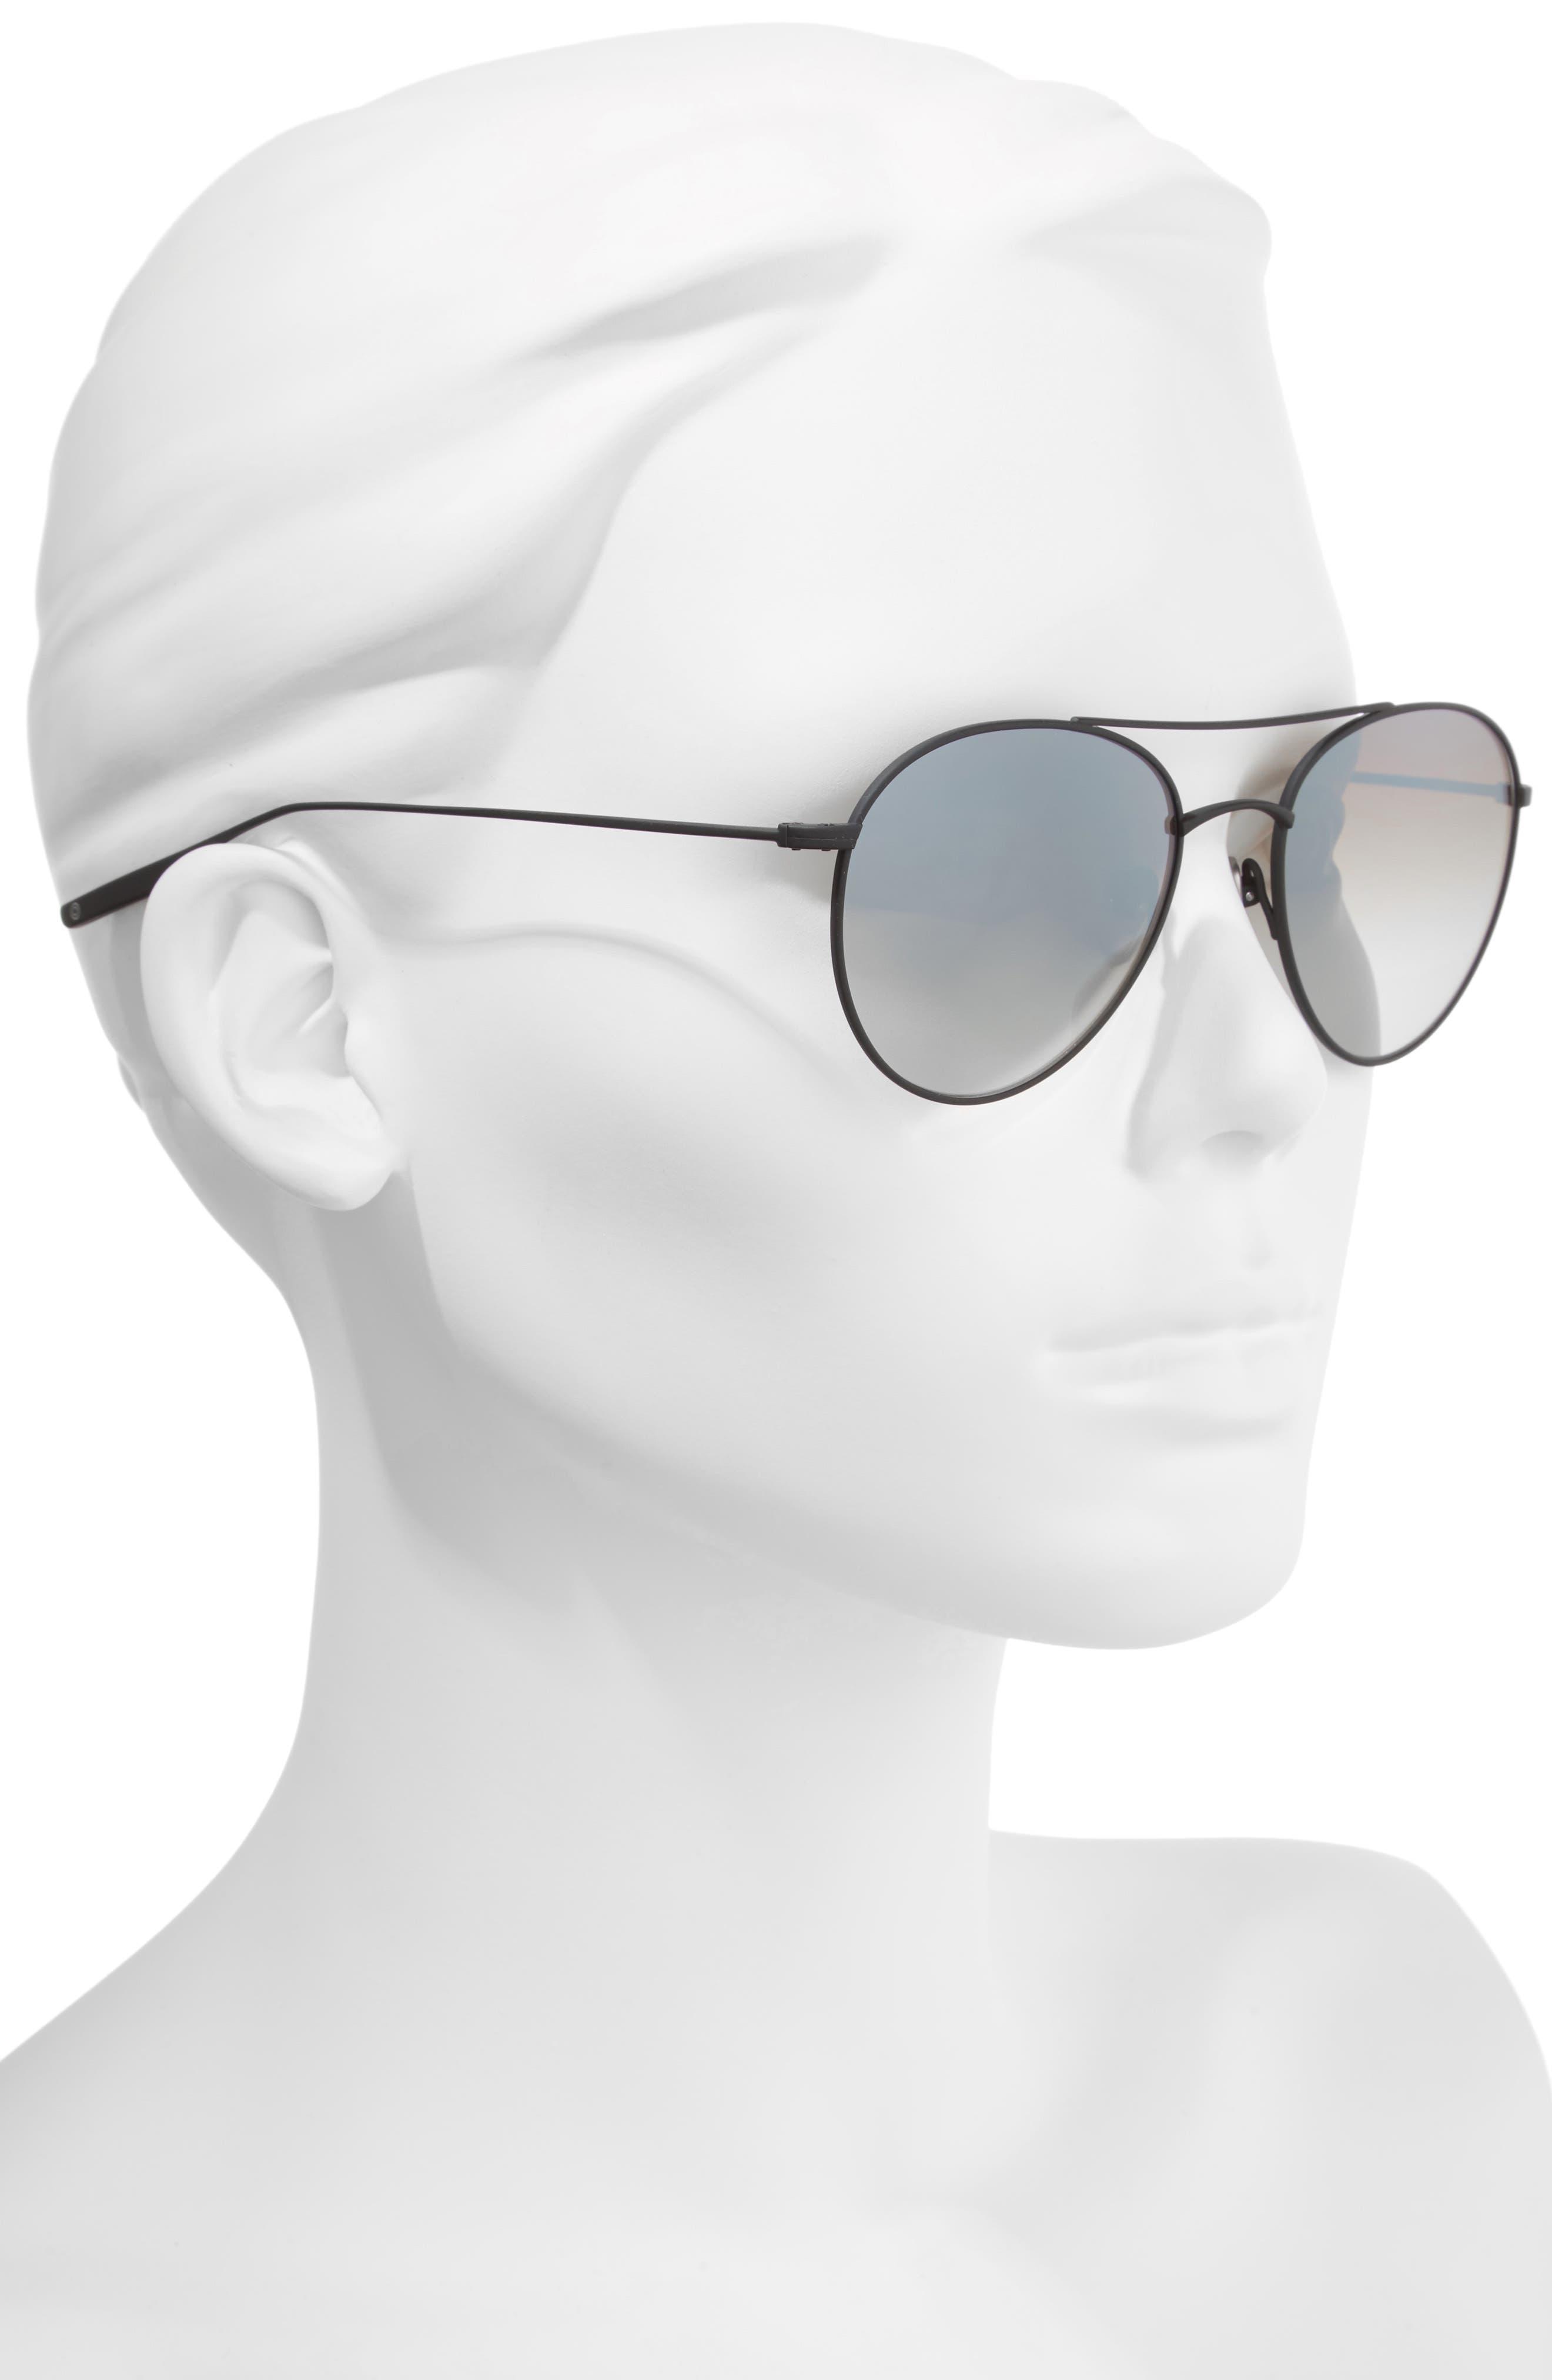 Fufkin 54mm Polarized Round Sunglasses,                             Alternate thumbnail 2, color,                             Black Sand